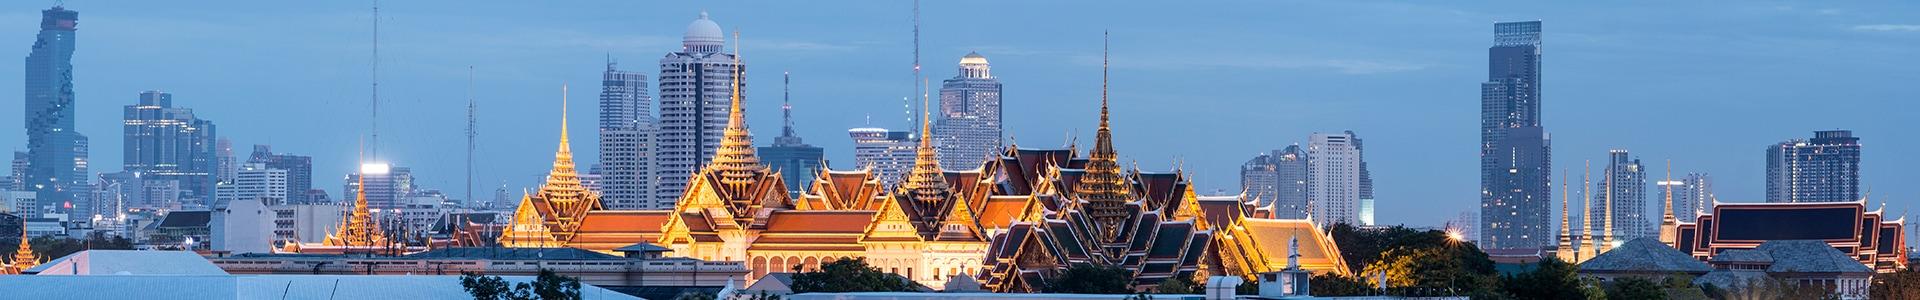 Voyage à Bangkok